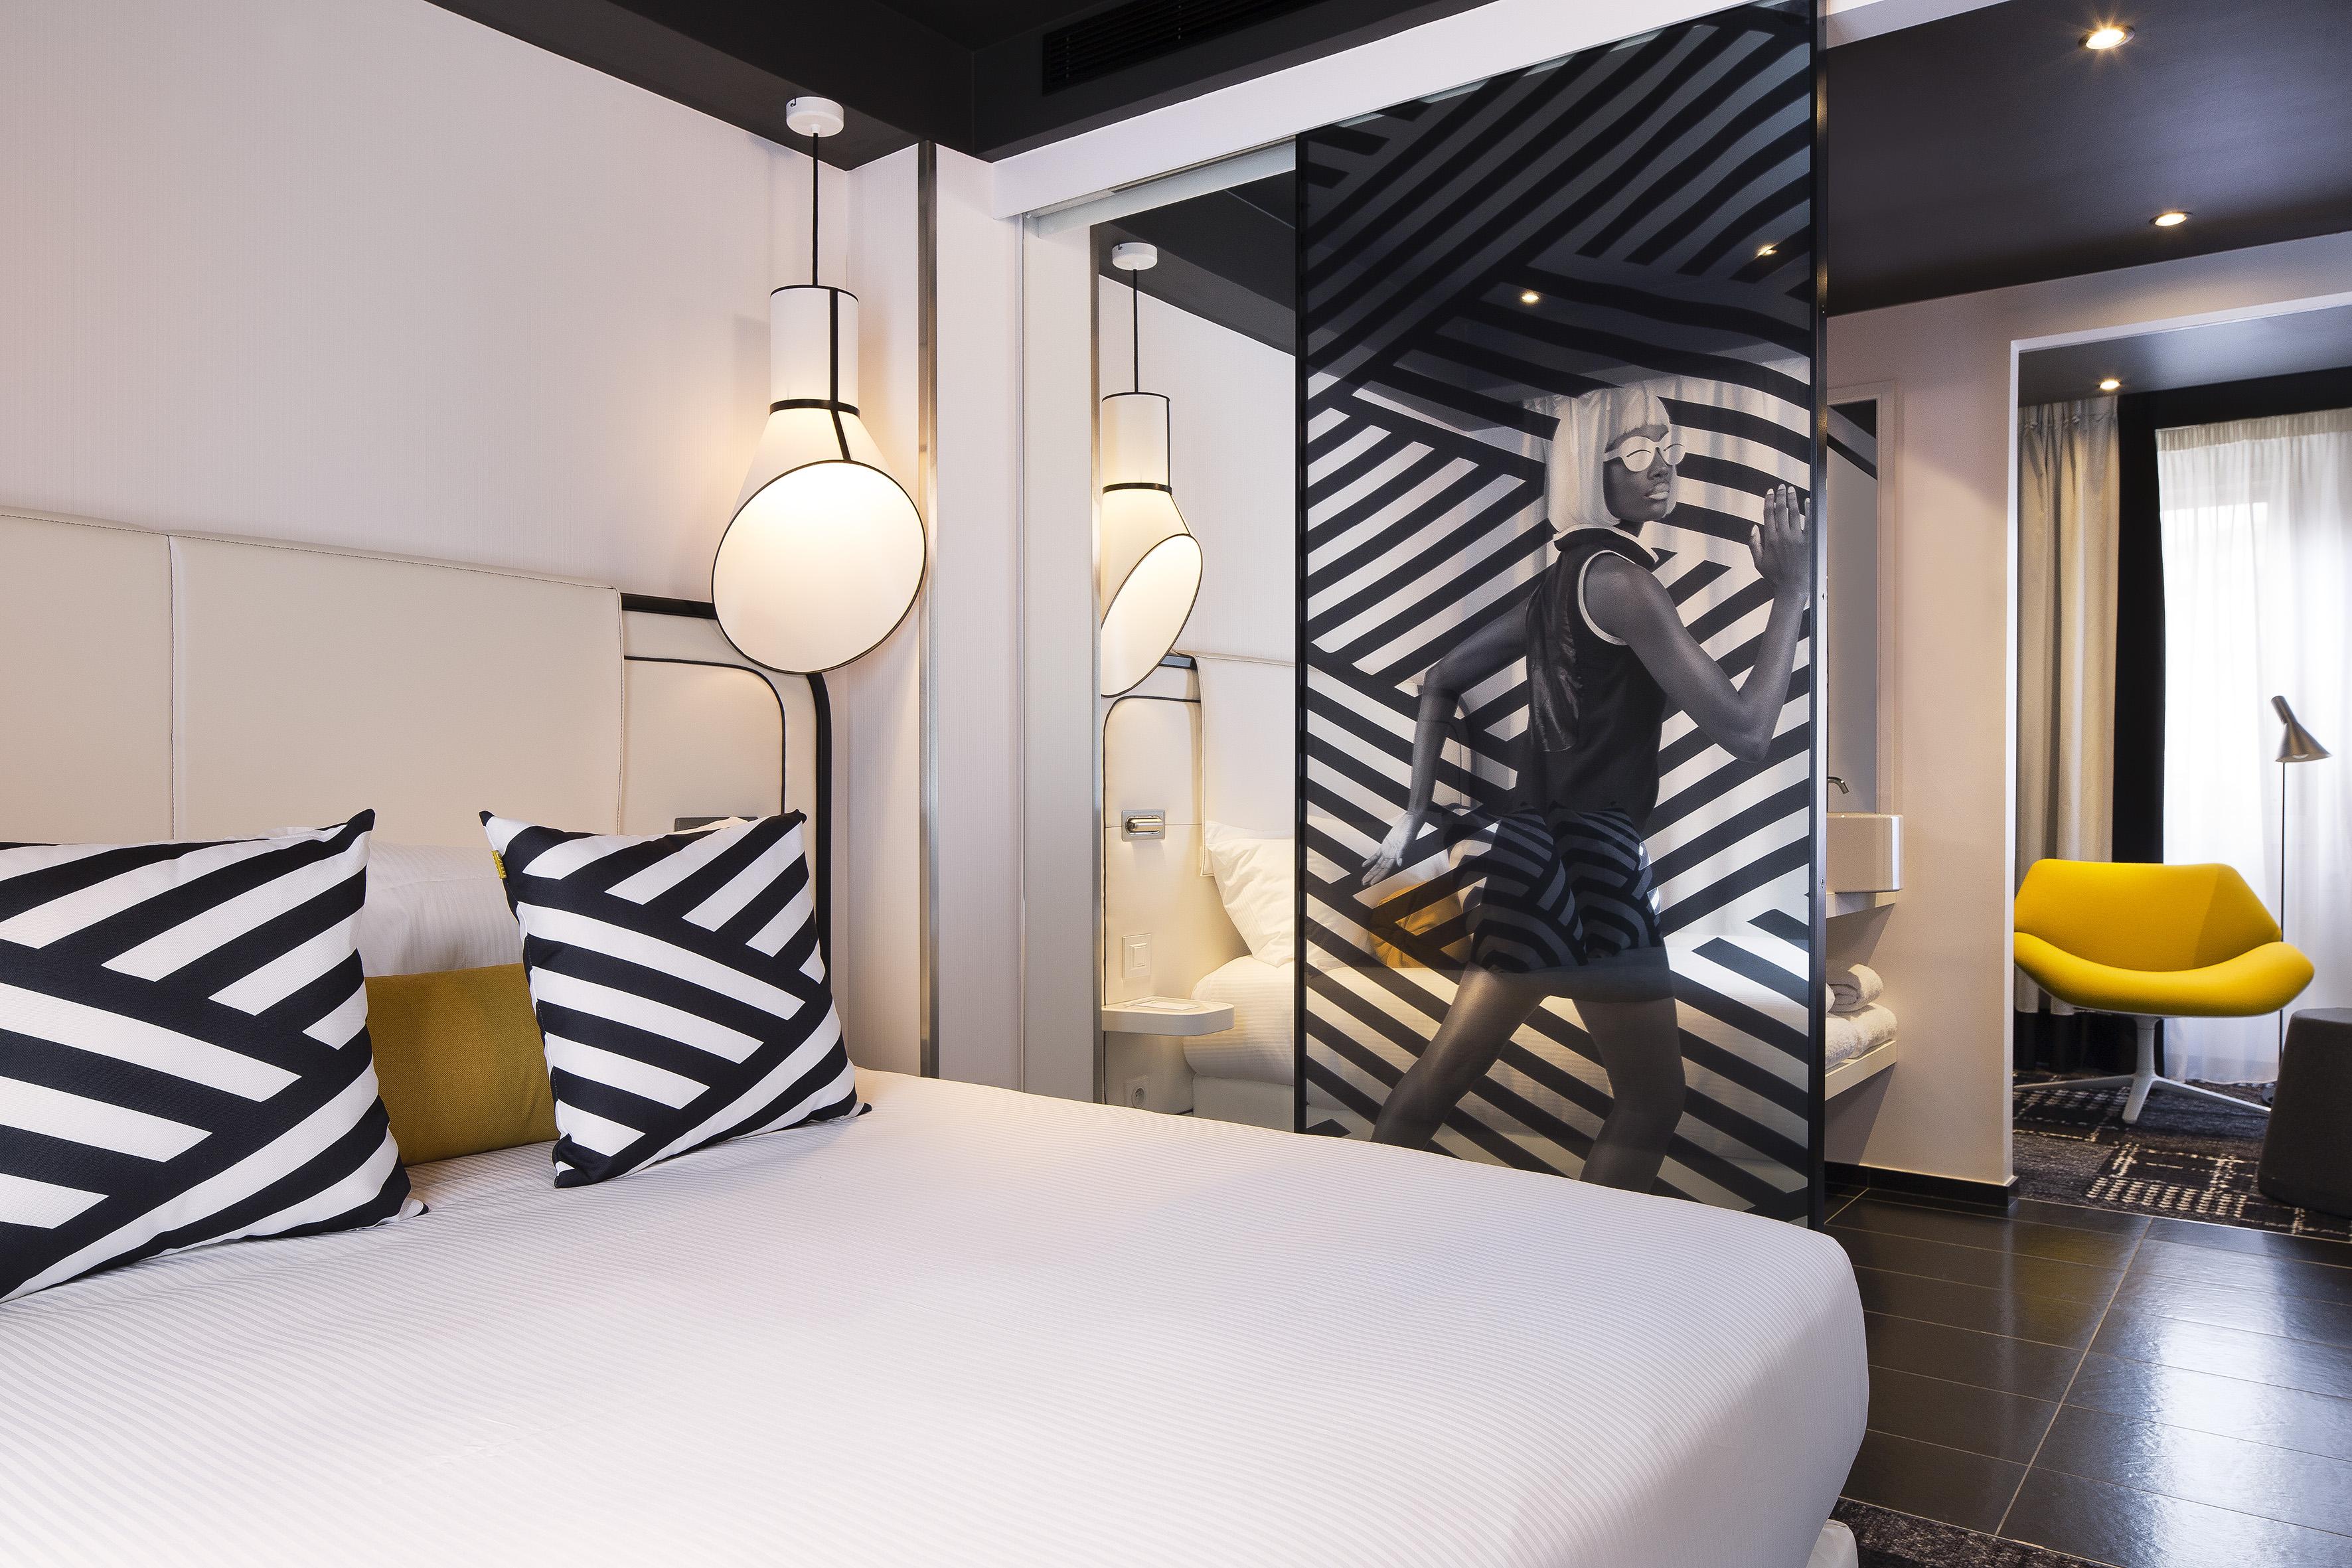 L 39 h tel ekta trois etoiles couture dailybedroom for Hotel design 3 etoiles paris